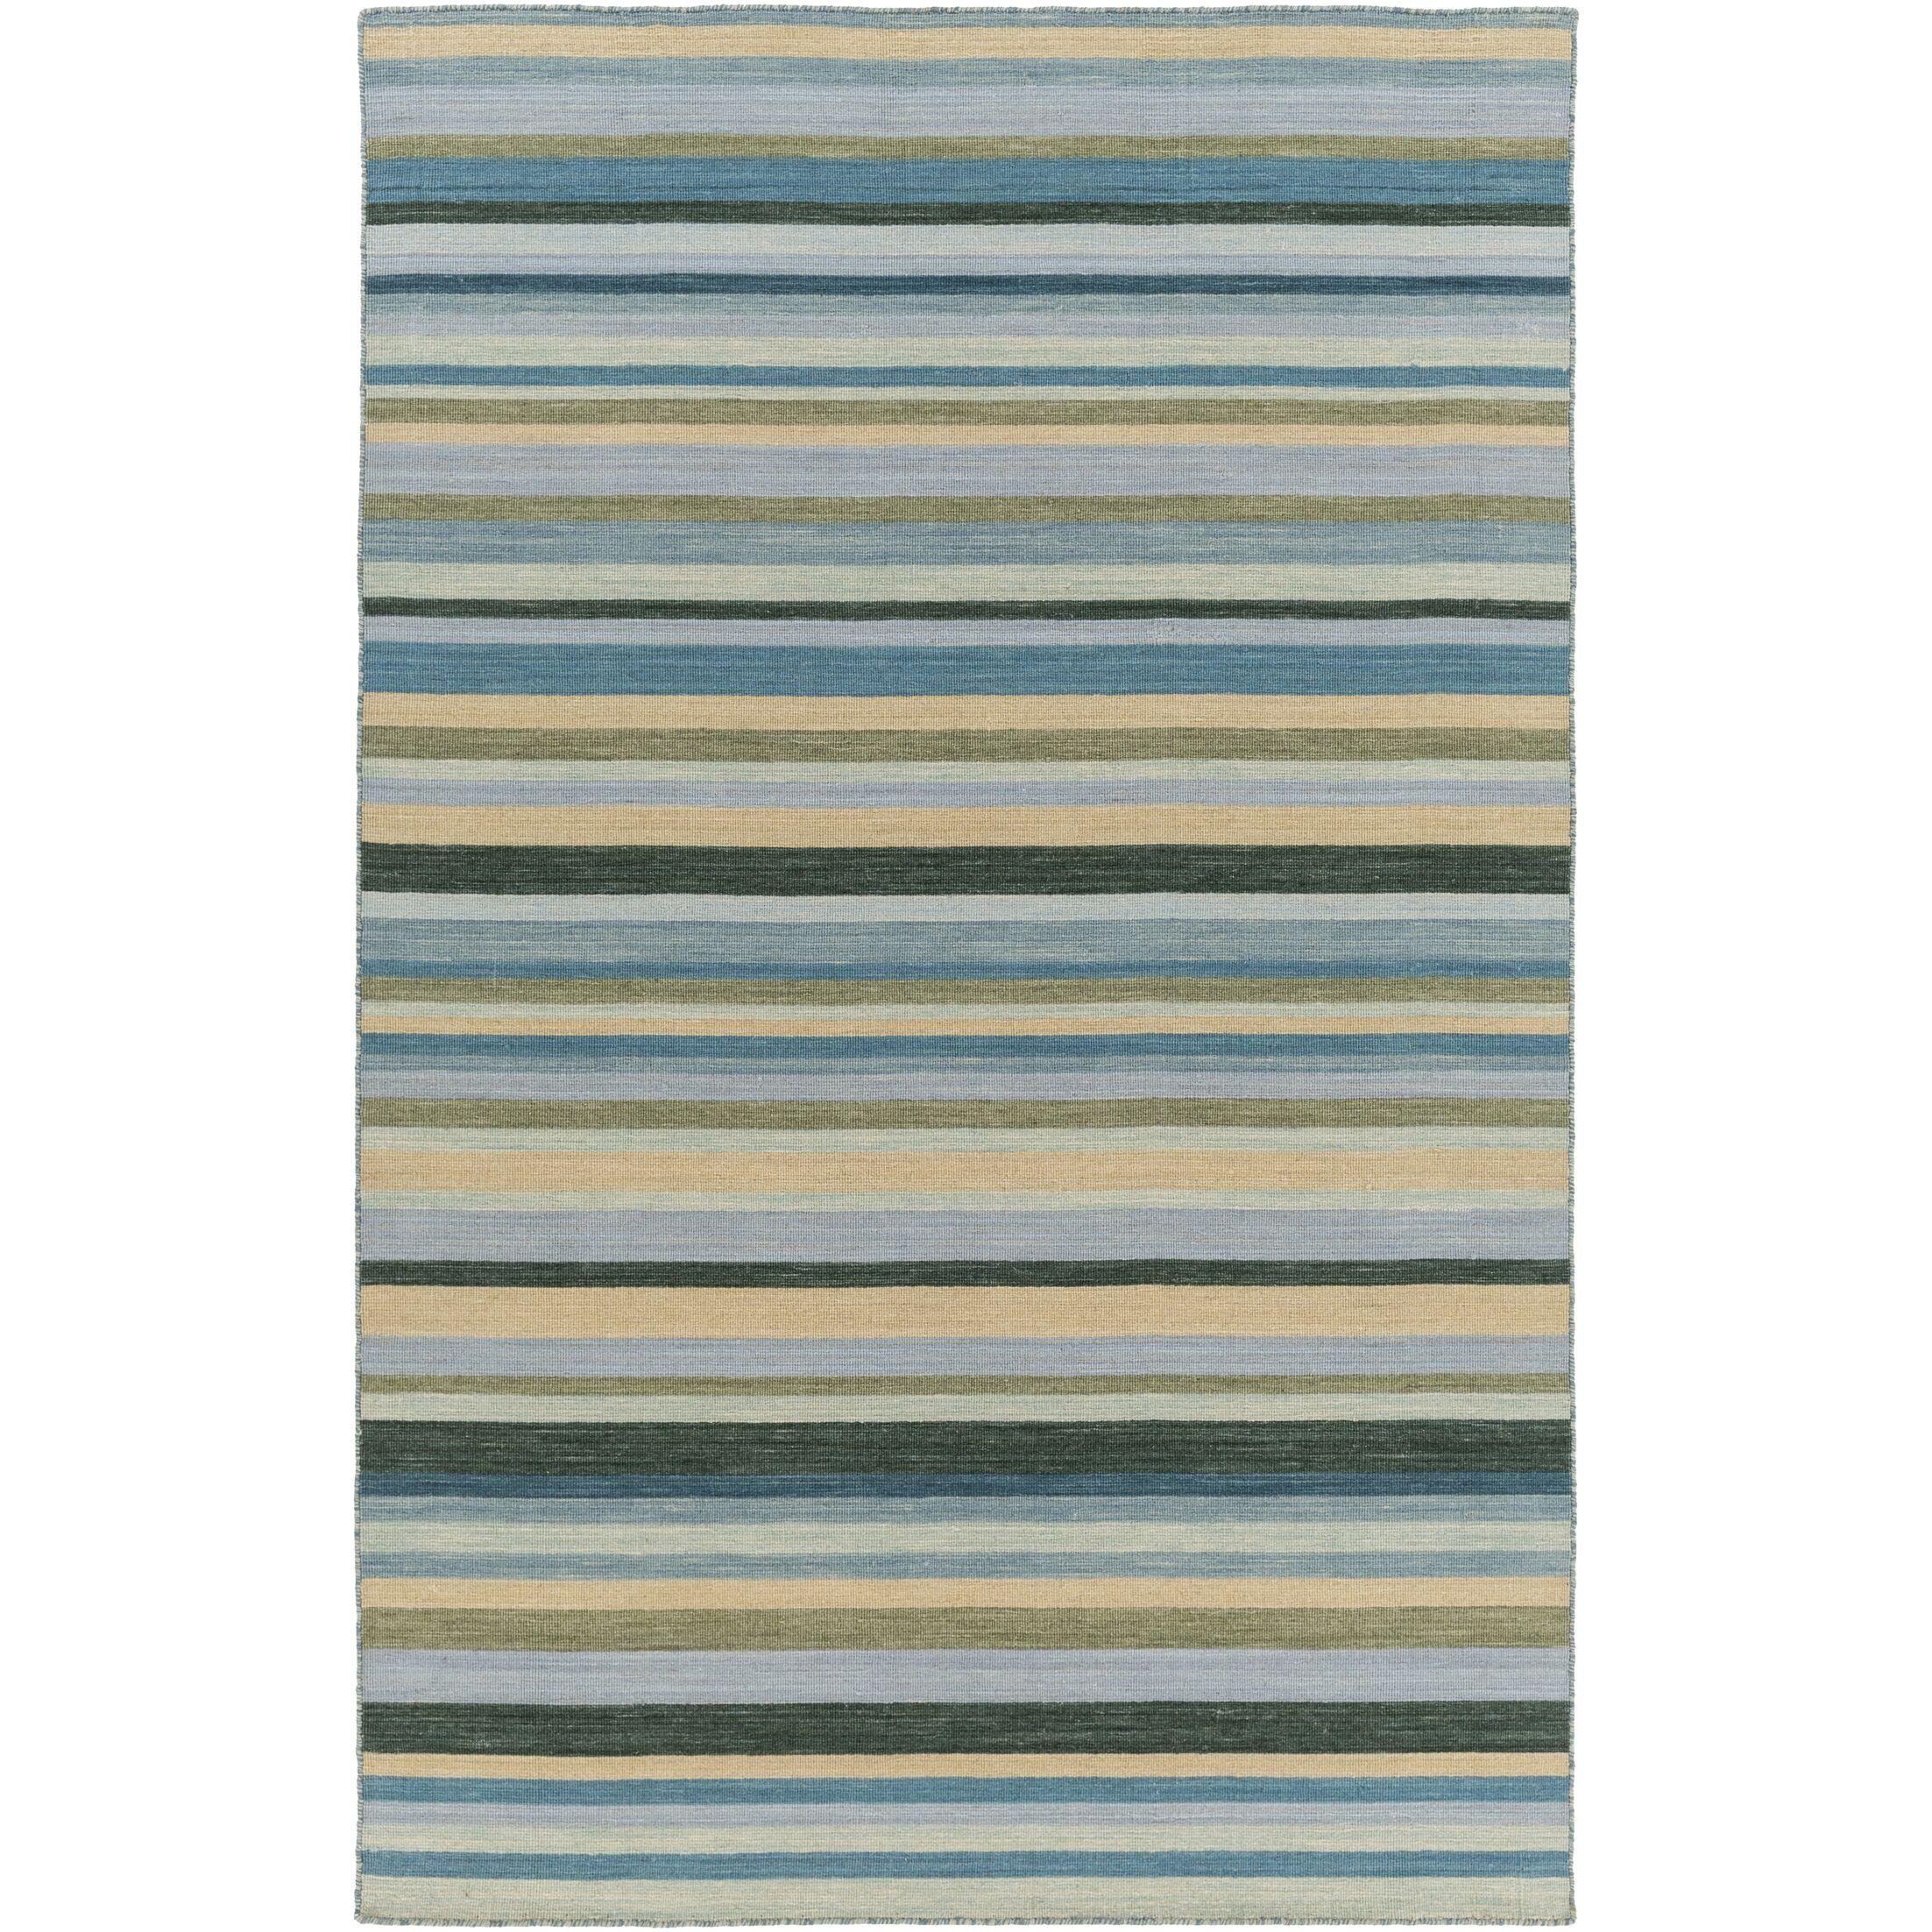 Dixon Hand-Woven Green Area Rug Rug Size: Rectangle 5' x 8'